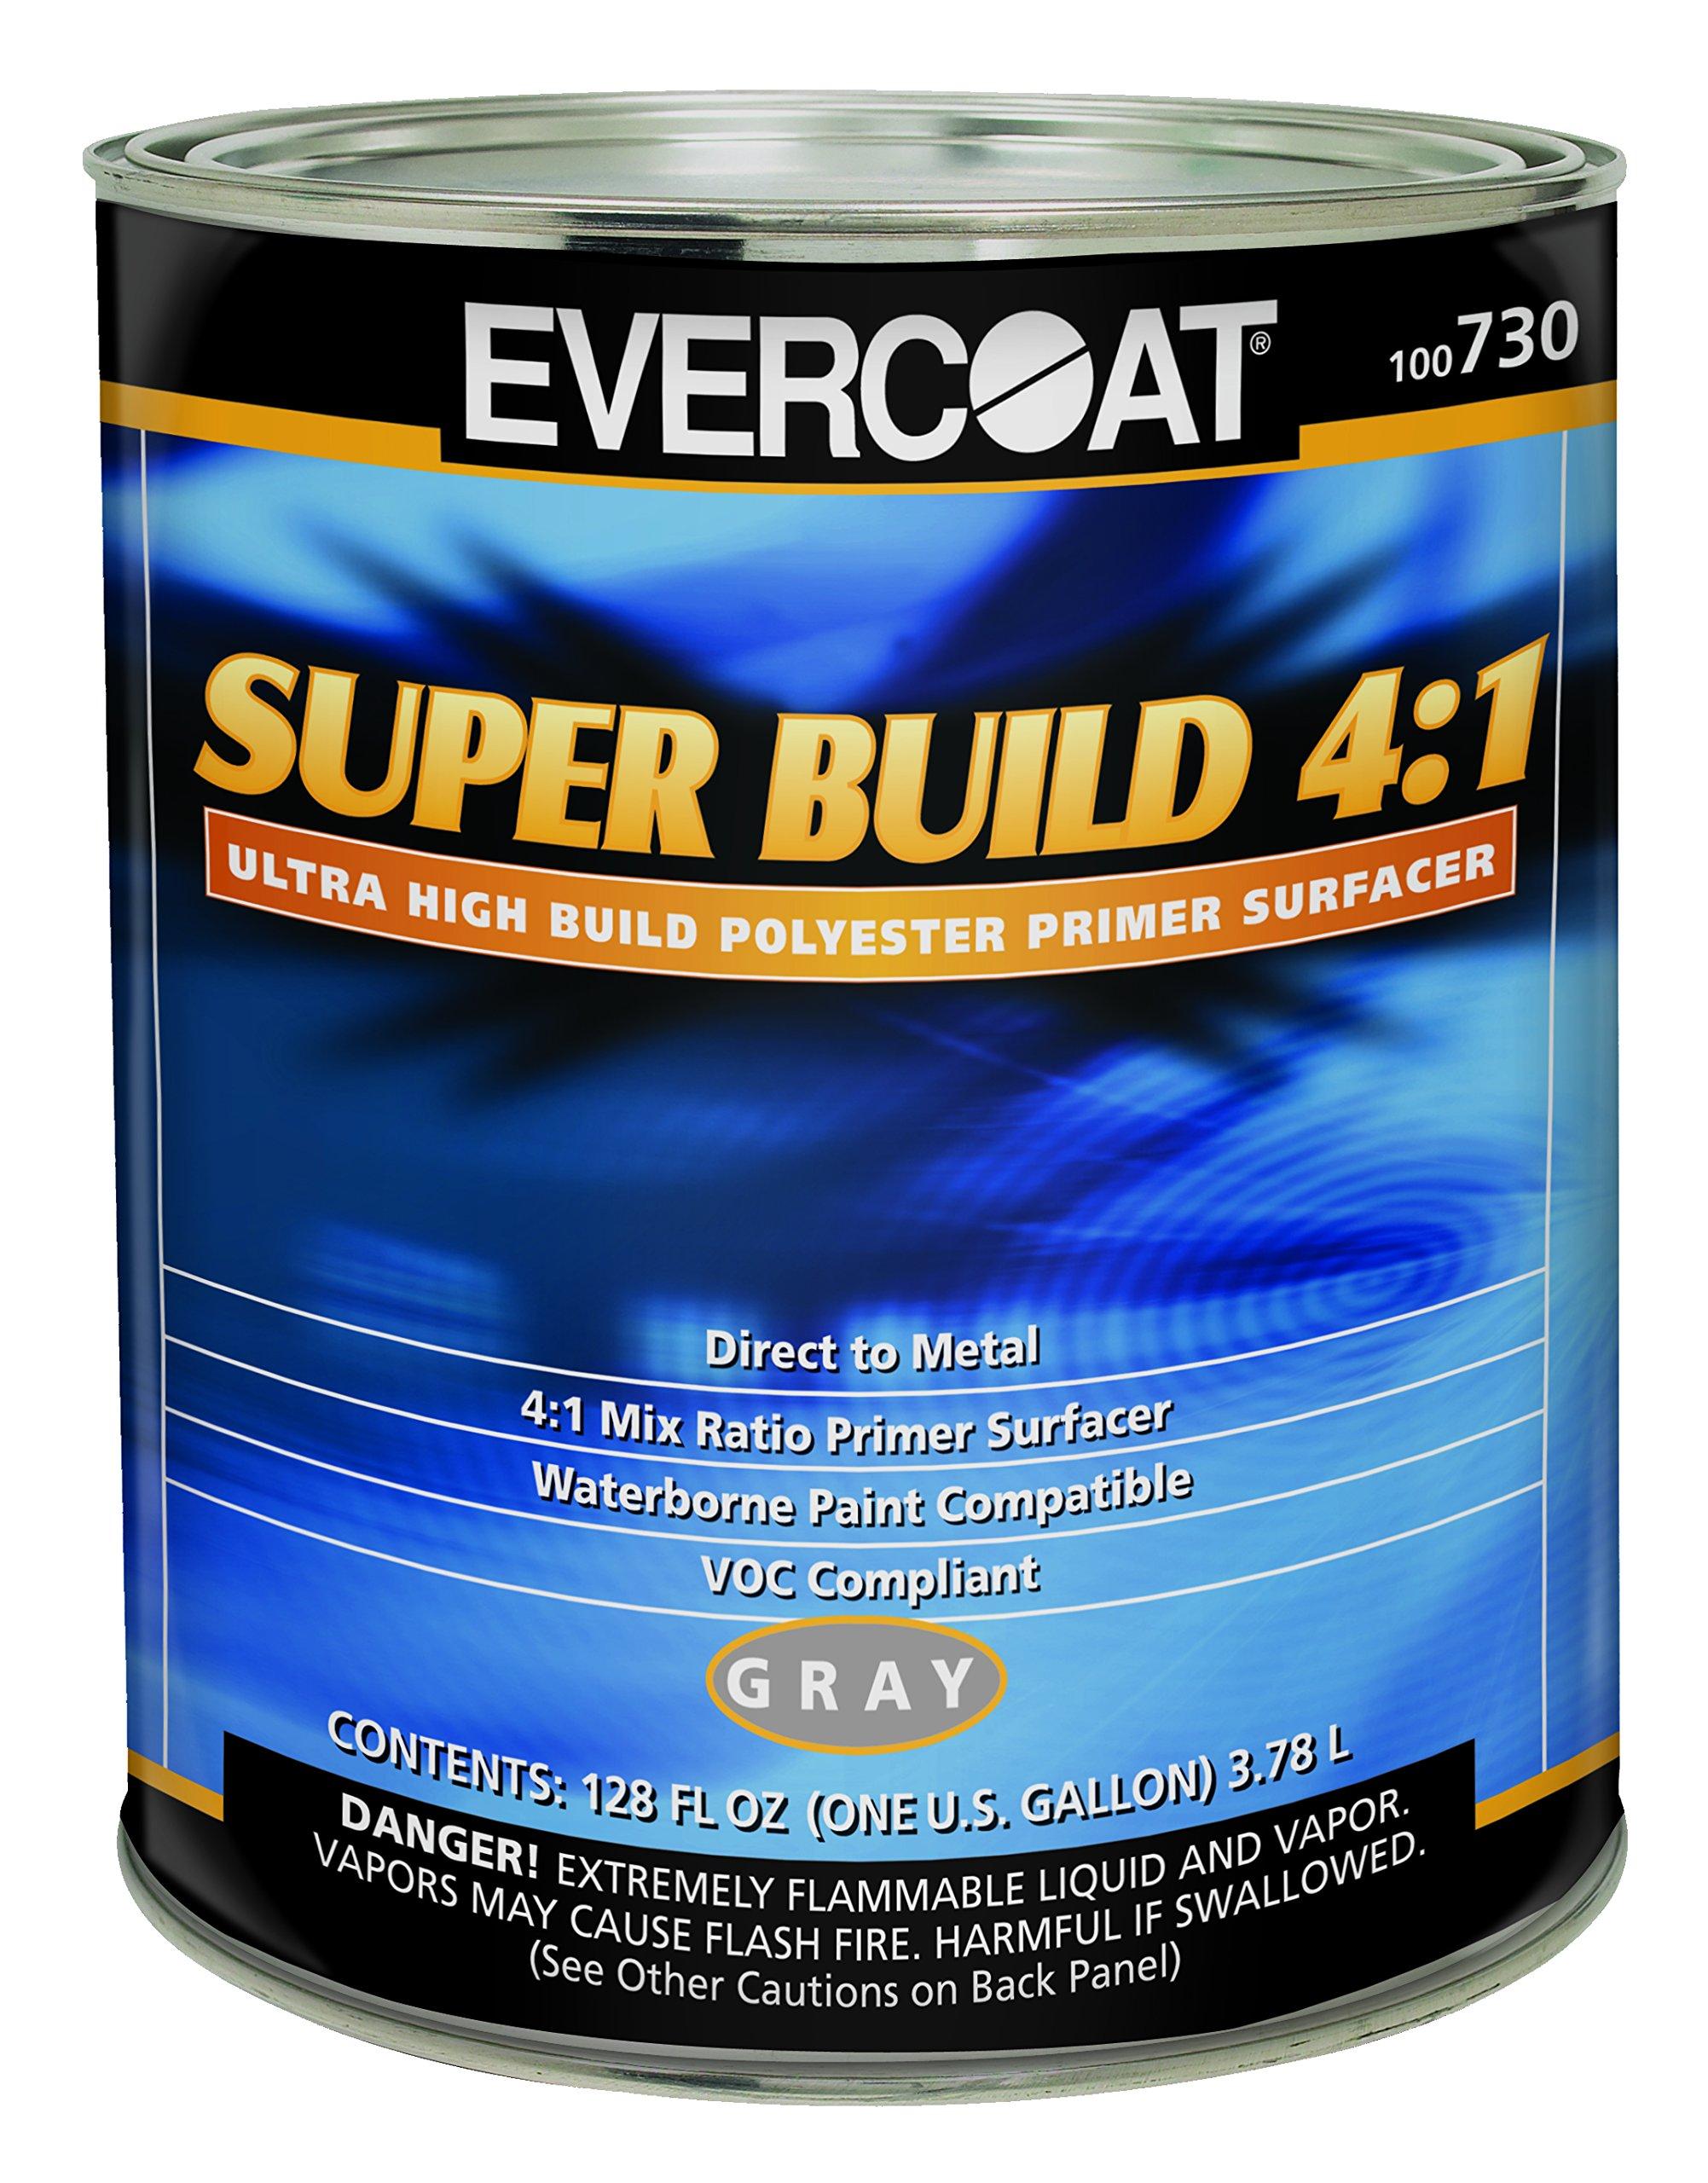 Evercoat 730 Super Build 4:1 Polyester Primer Surfacer - 1 Gallon by Evercoat